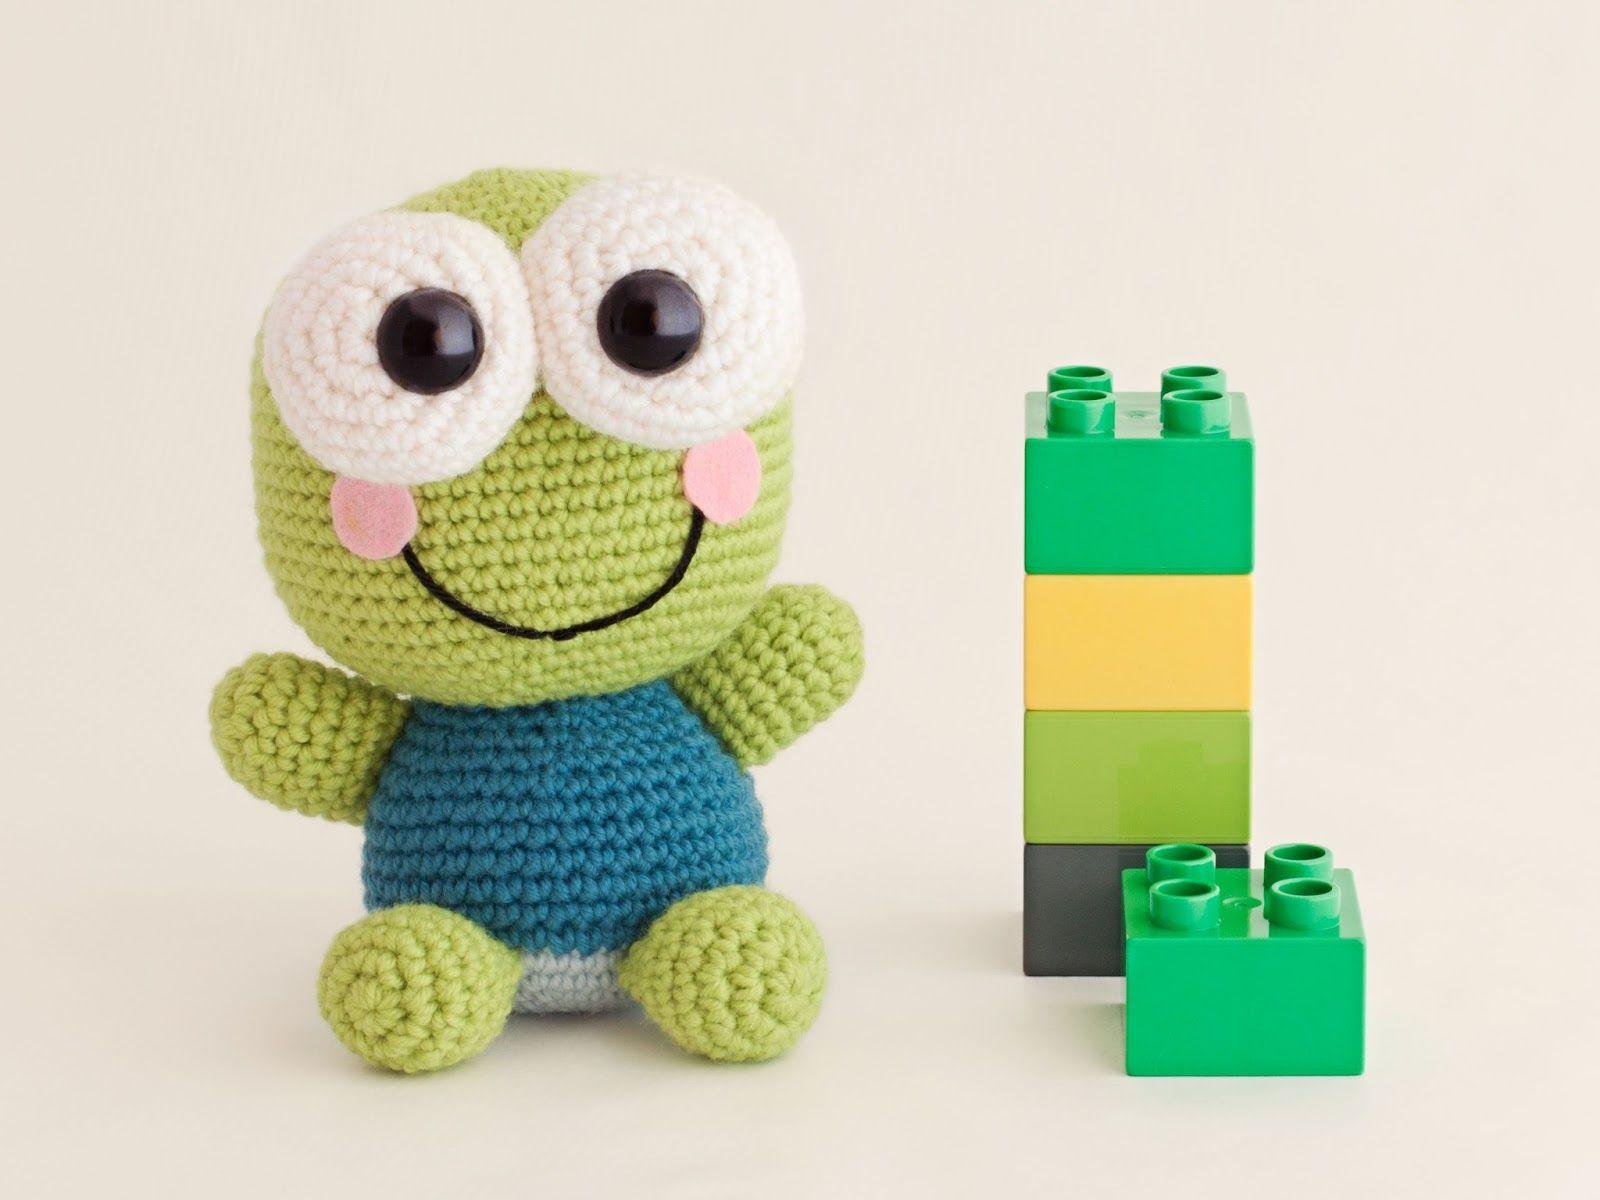 Tutorial Amigurumi Cerdito : Amigurumi frog kerokeroppi free crochet pattern tutorial